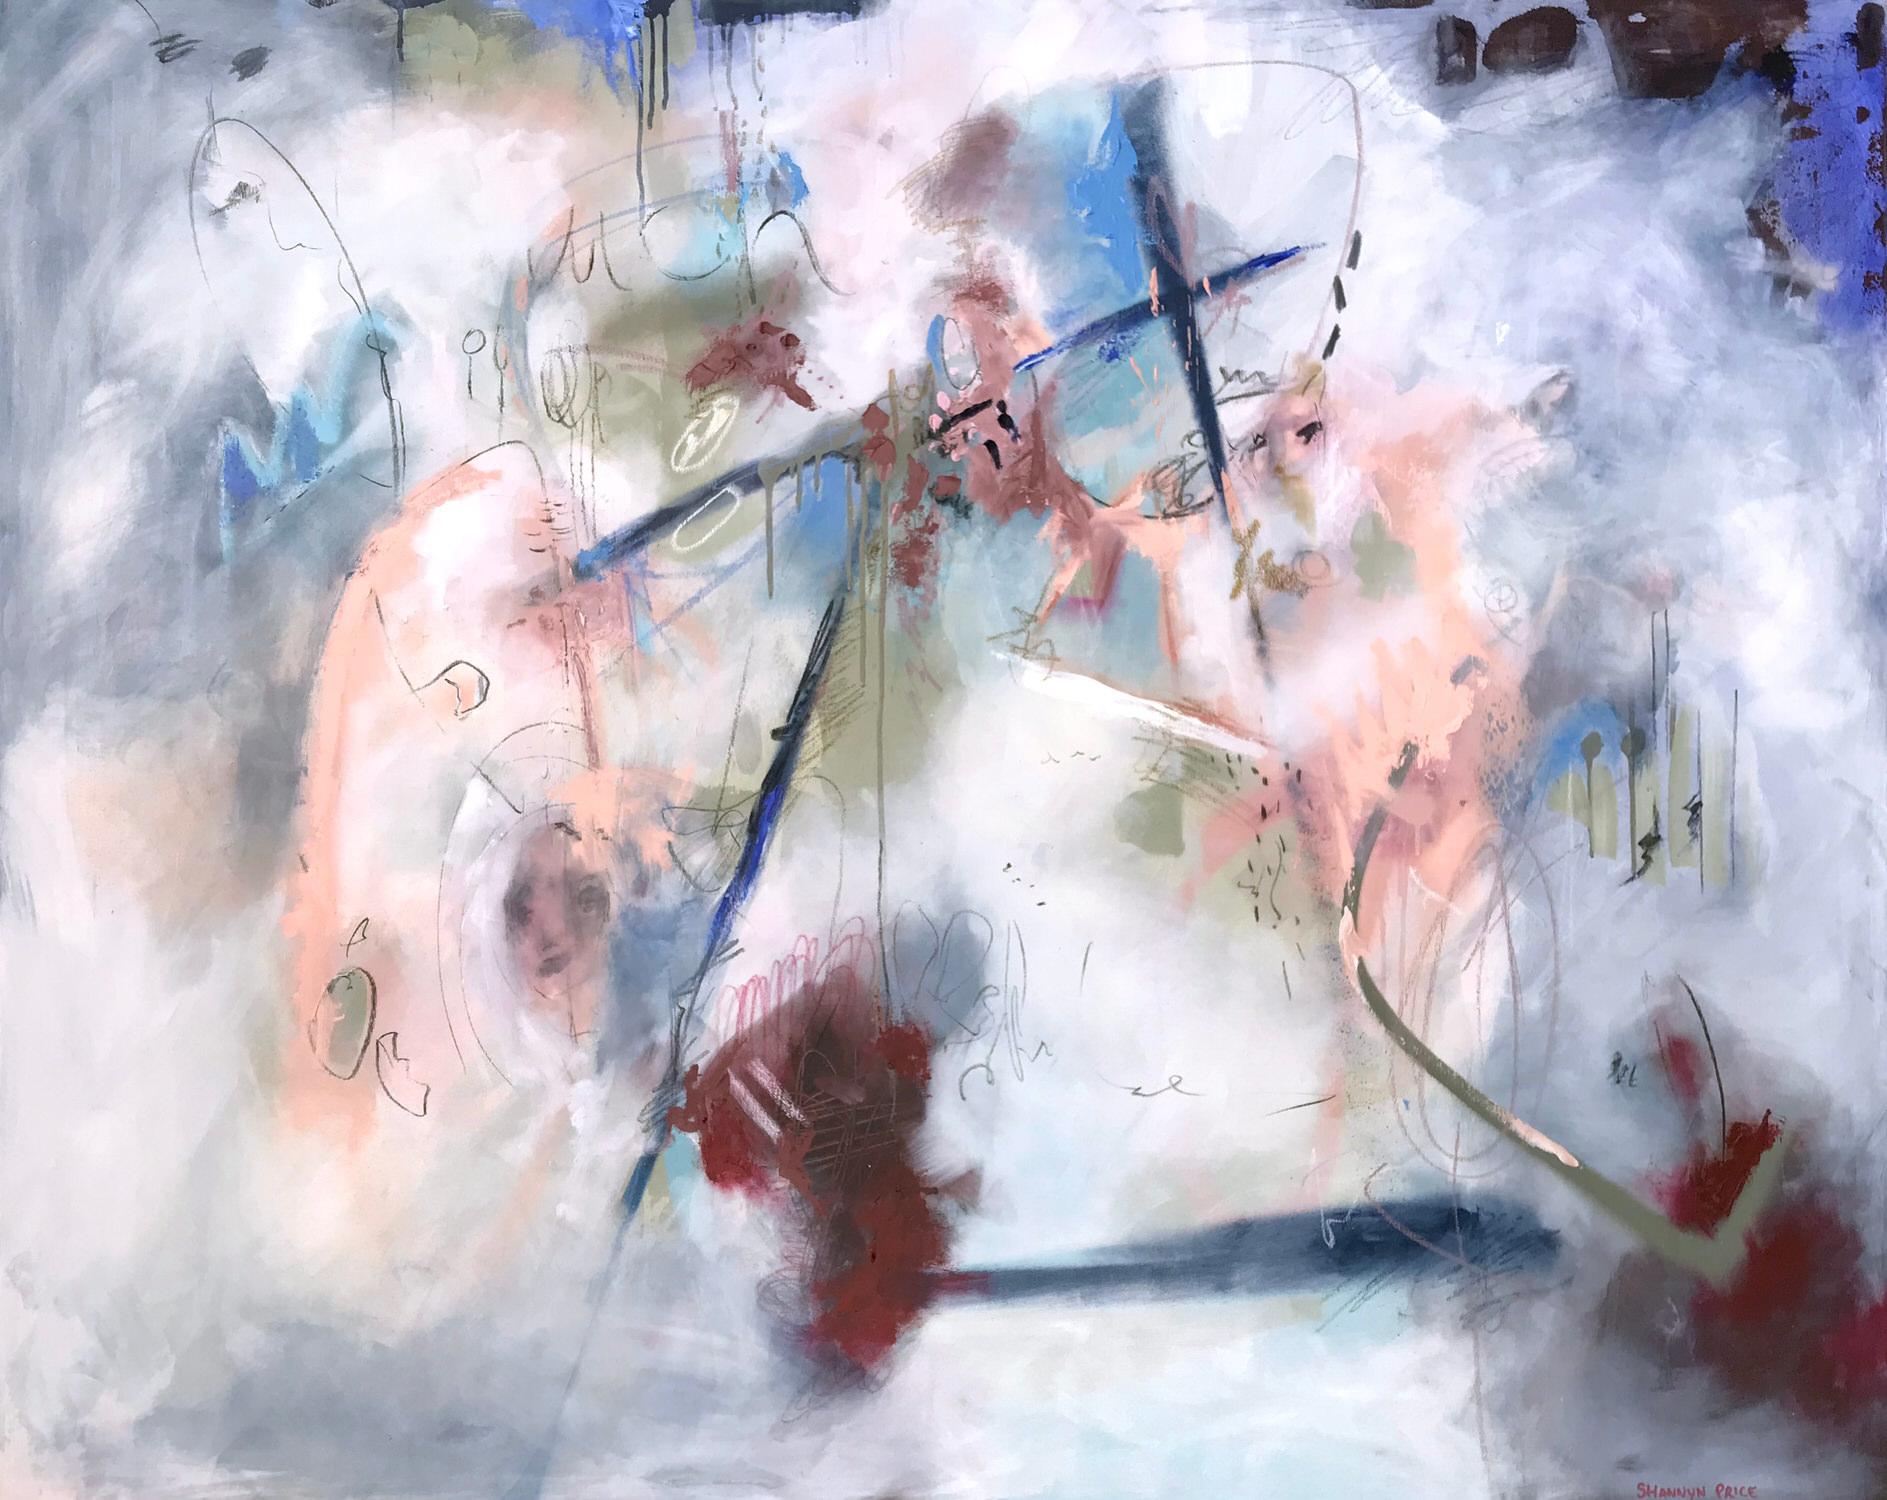 Shannyn Alexene PriceBlurred Lines, 2019 Mixed Media on Canvas 152 x 122 cm.jpg